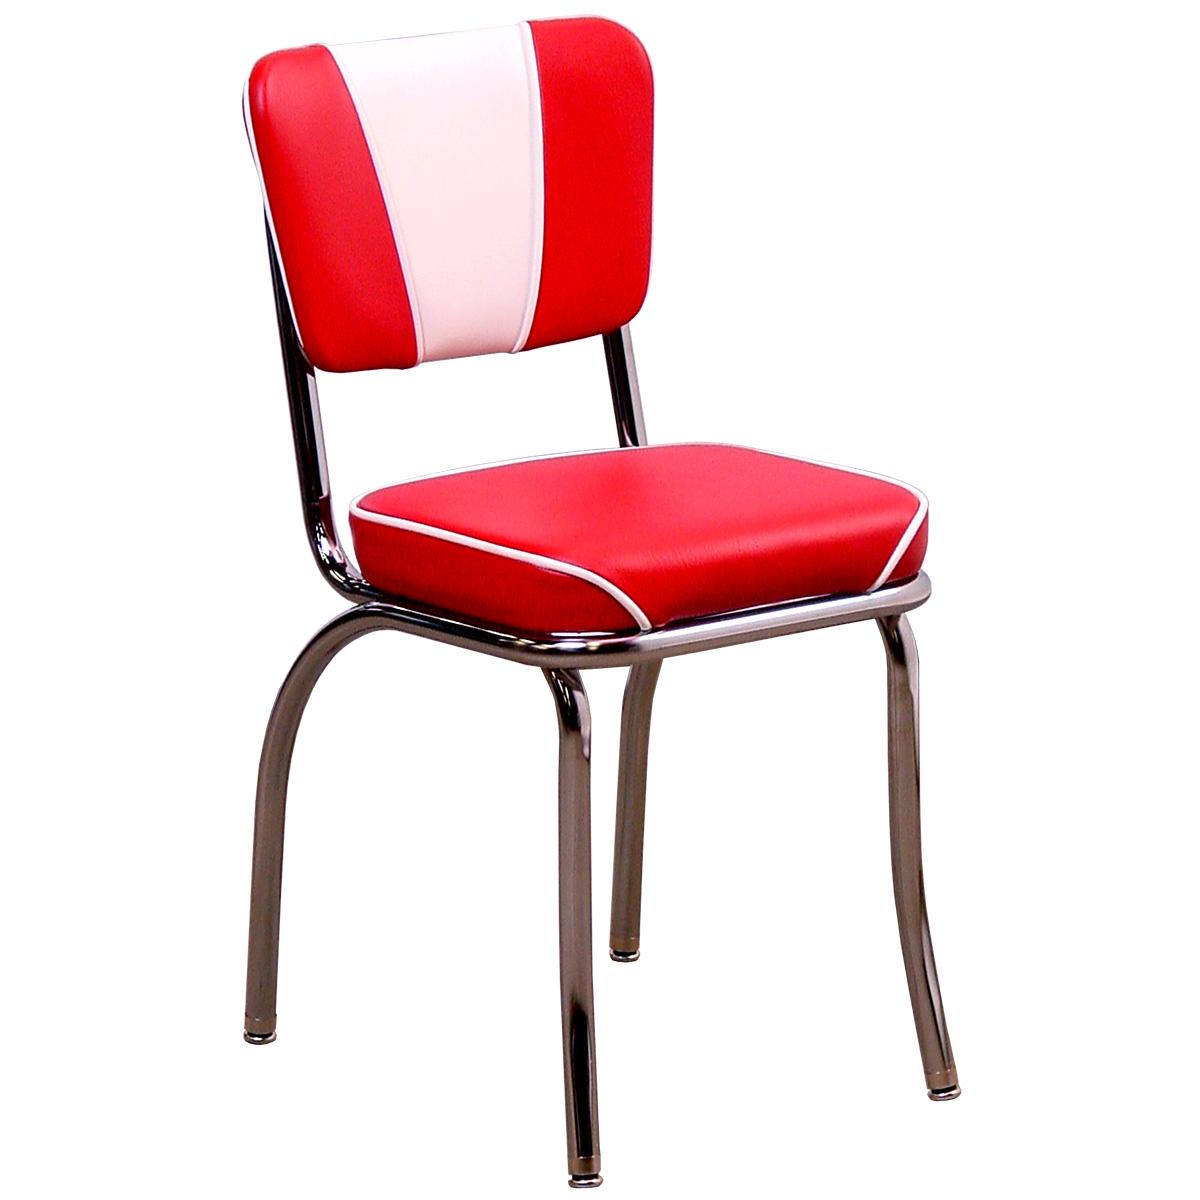 retro kitchen chairs elmo chair walmart transform your into a